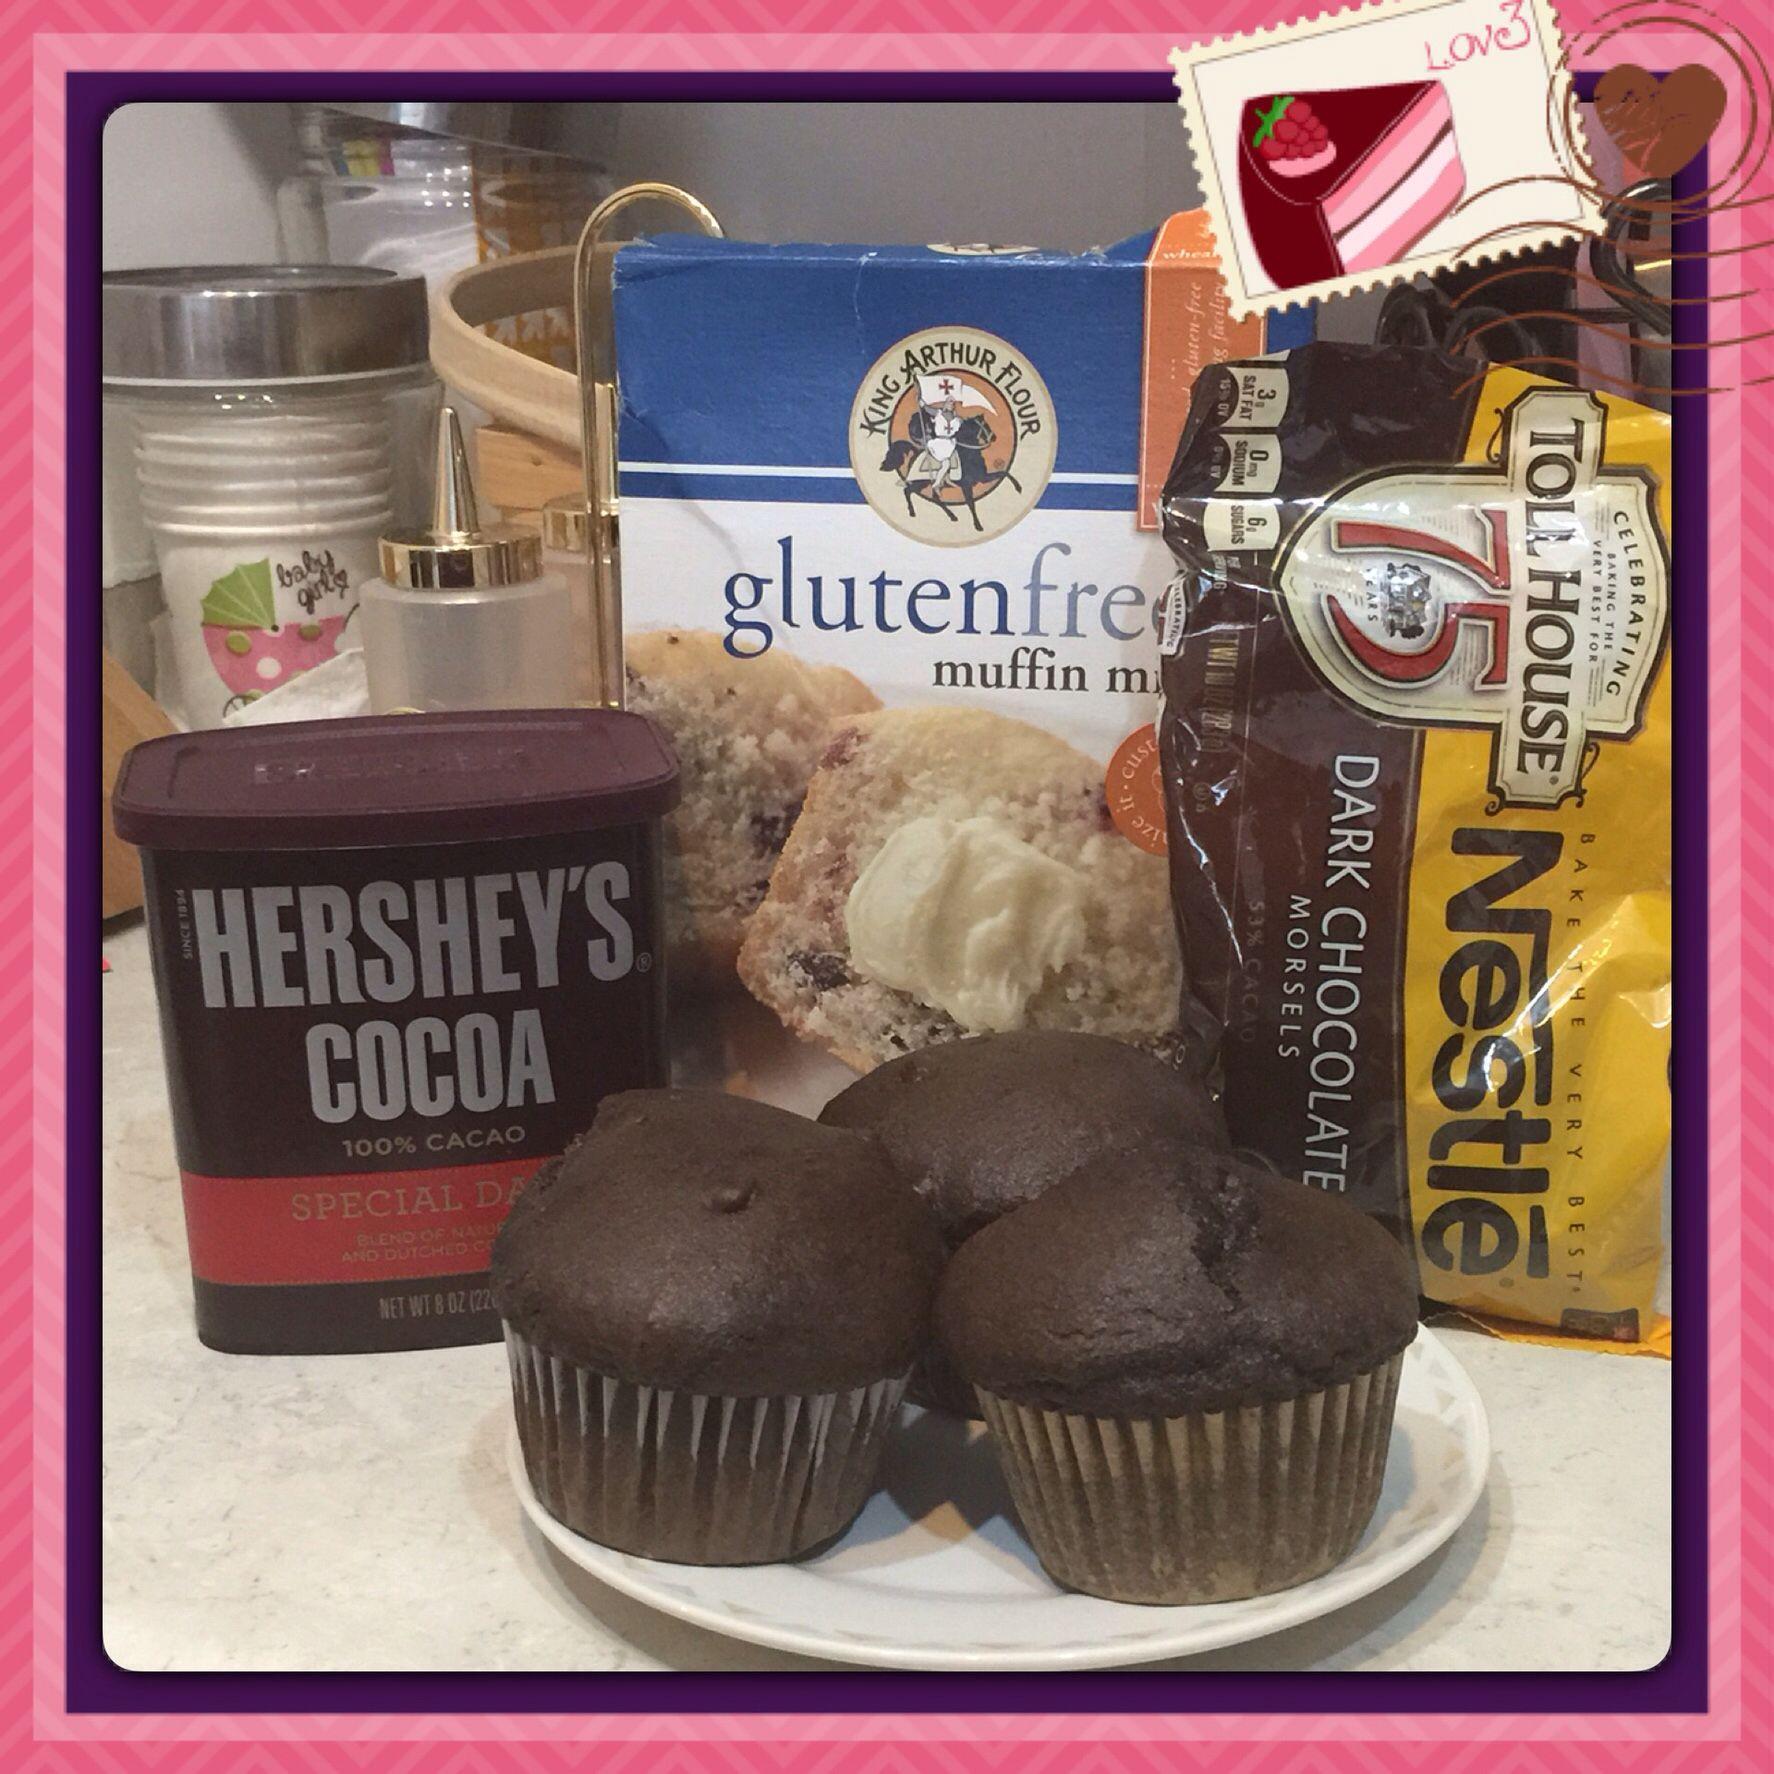 Double dark chocolate muffins glutenfree 1 box king